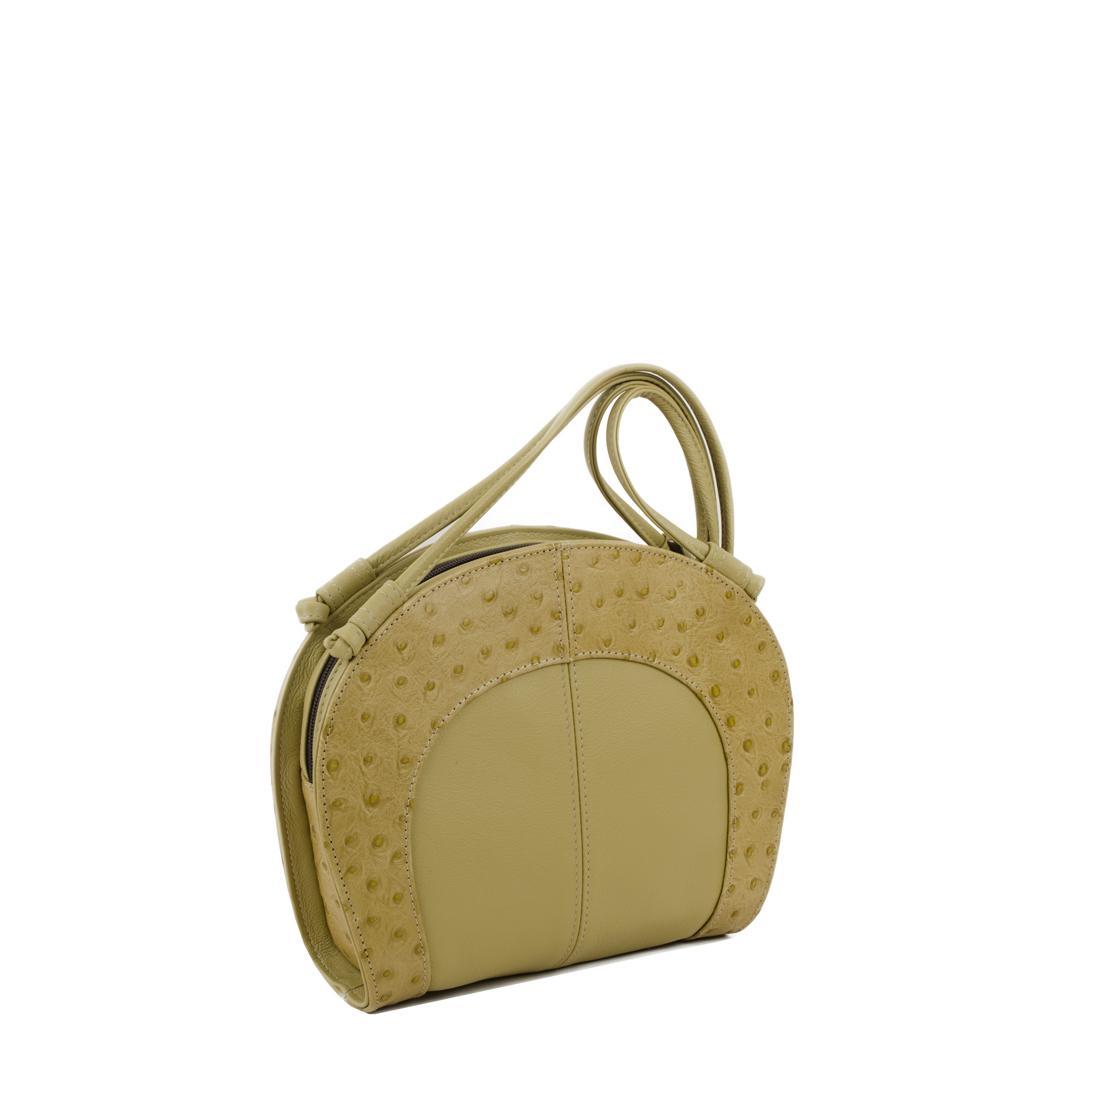 Molly Ostrich Lime Print Leather Shoulder Bag